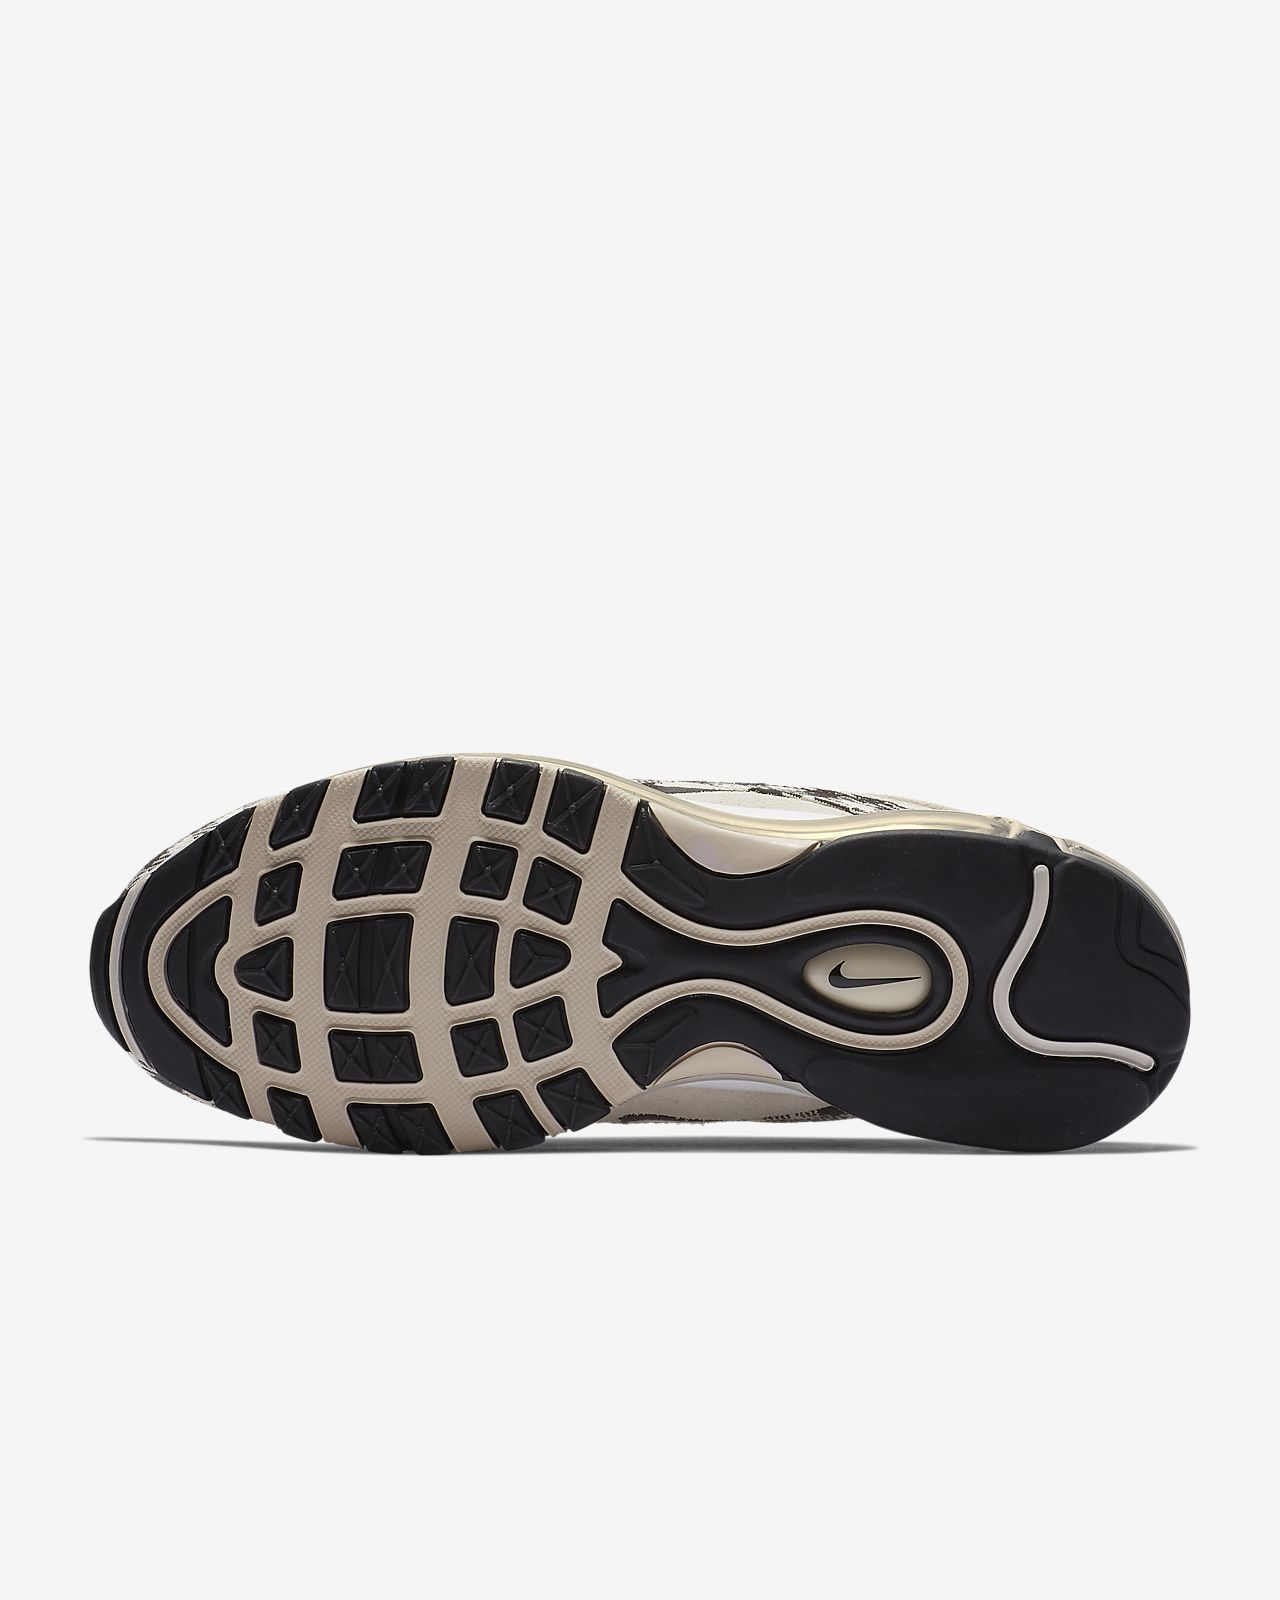 51a8a578282 Nike Air Max 97 Premium Men s Shoe. Nike.com